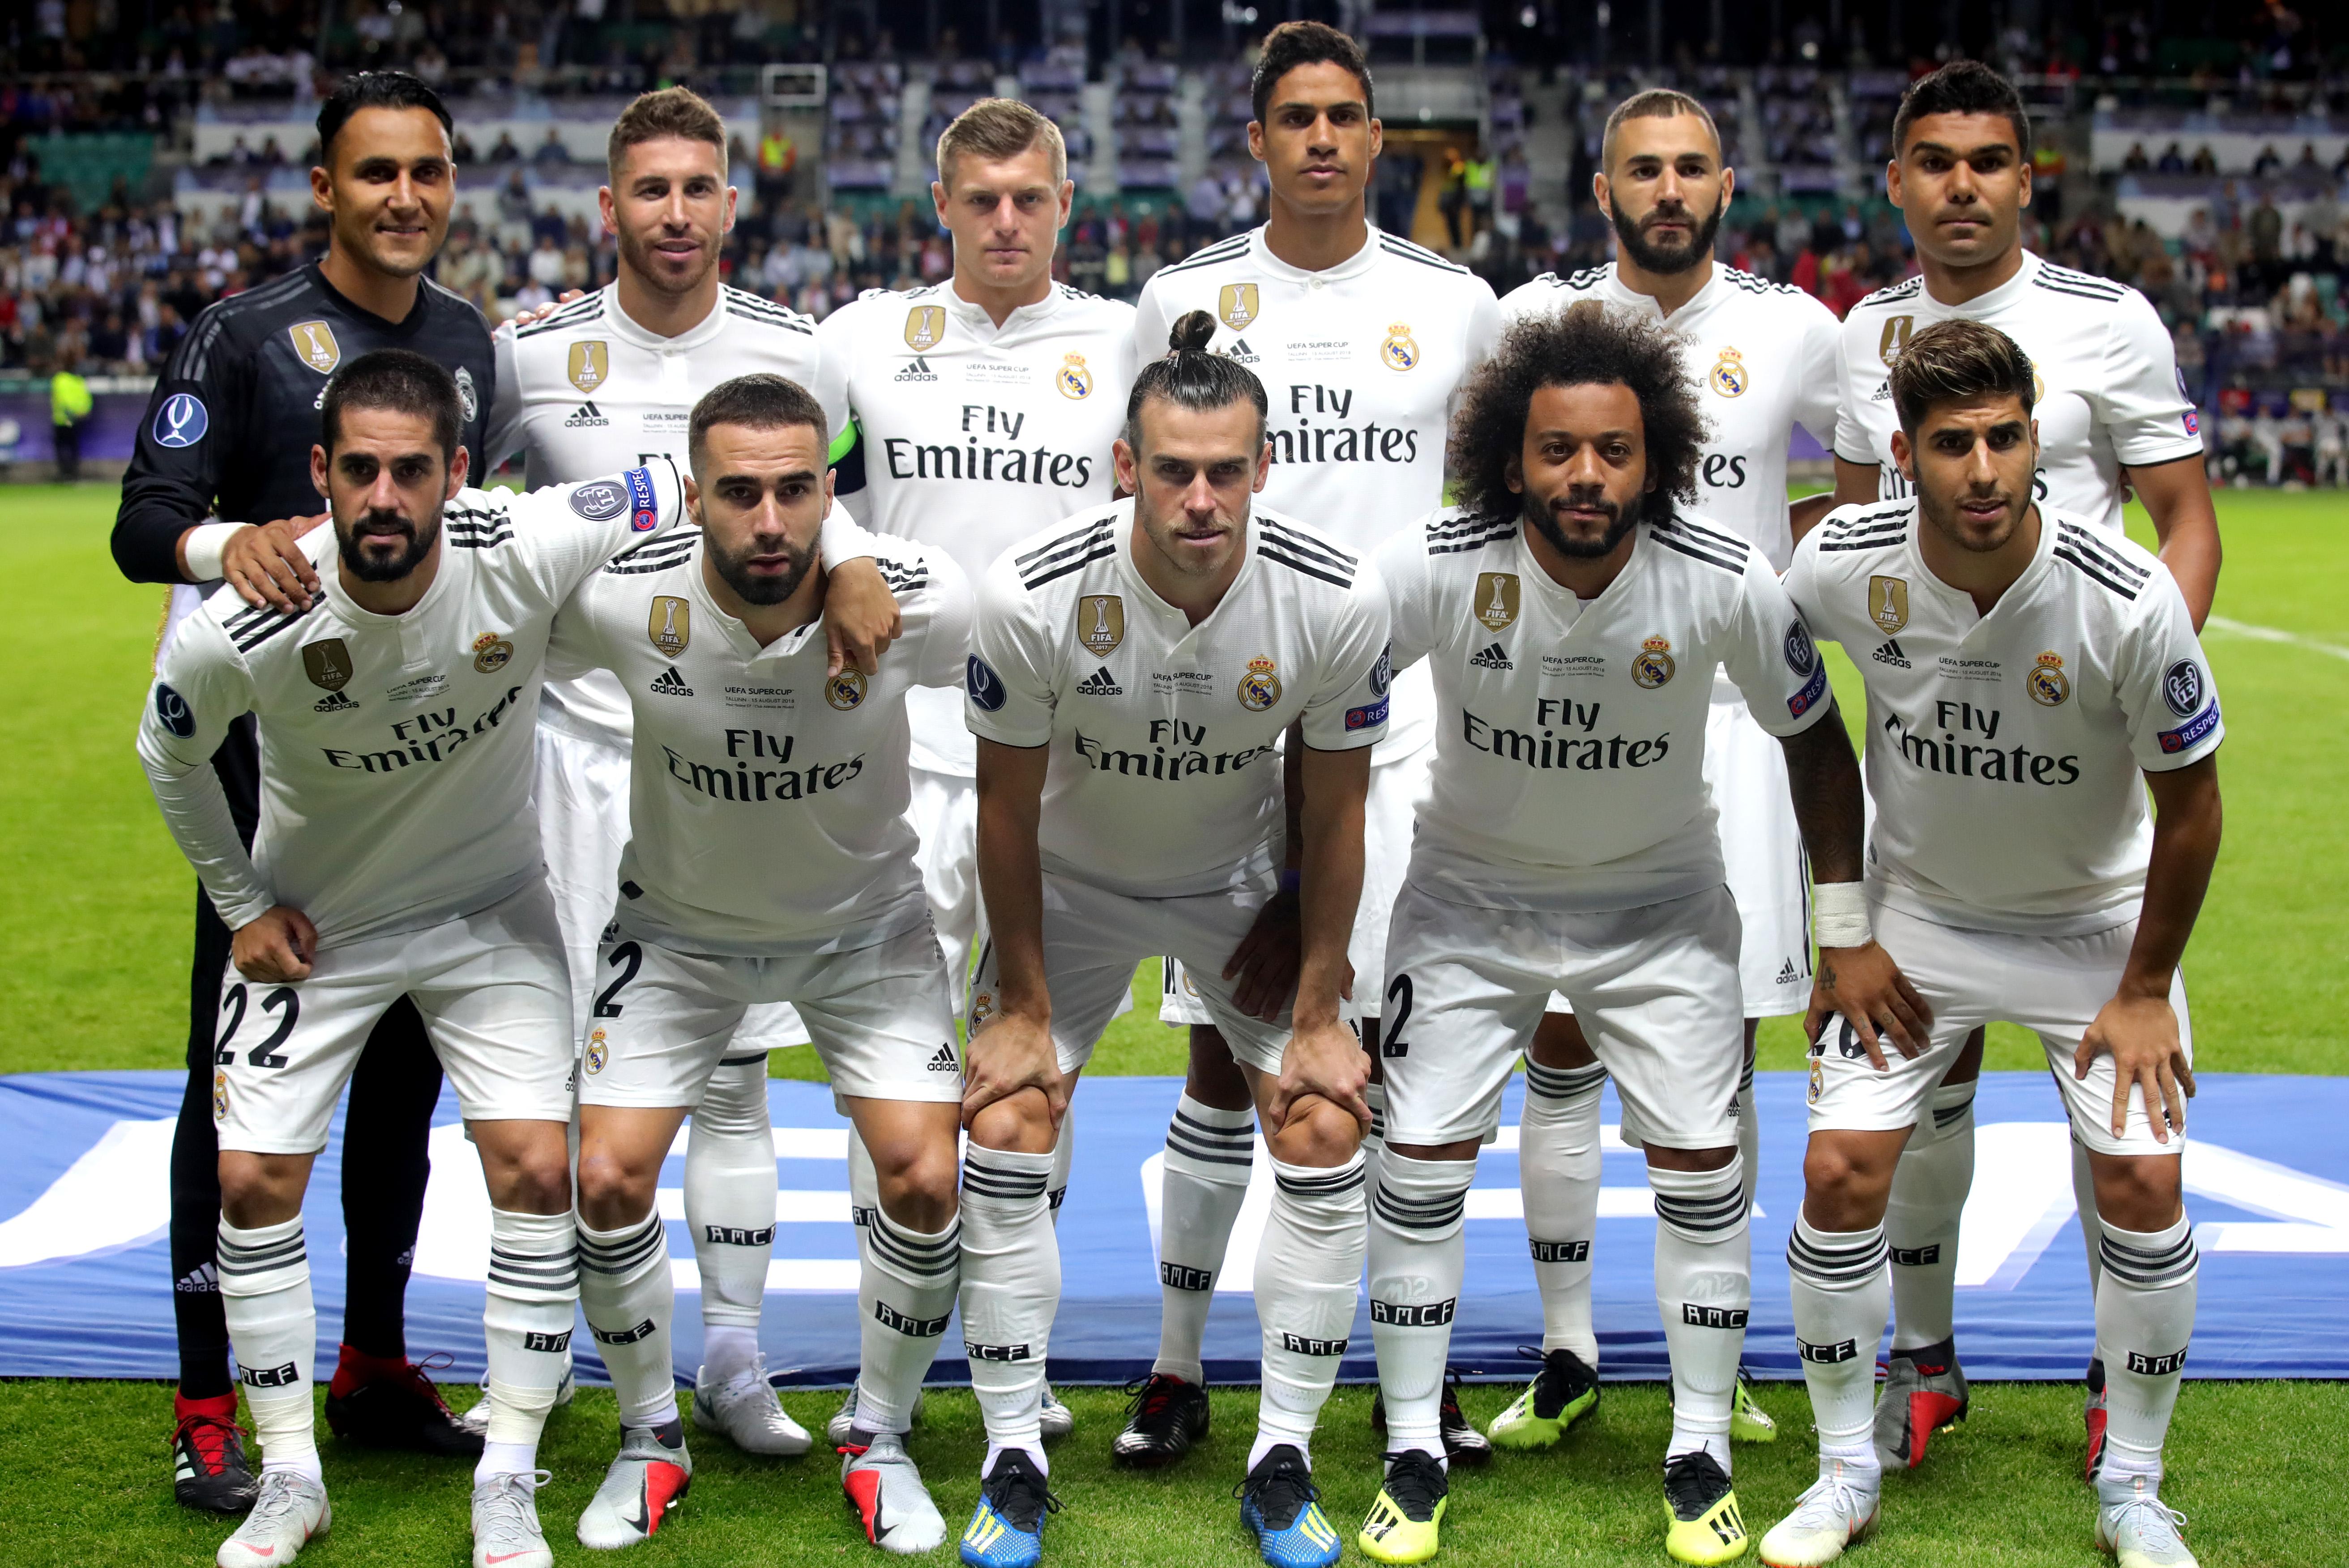 Managing madrid a real madrid community player ratings real madrid vs atletico madrid 2018 uefa super cup stopboris Images